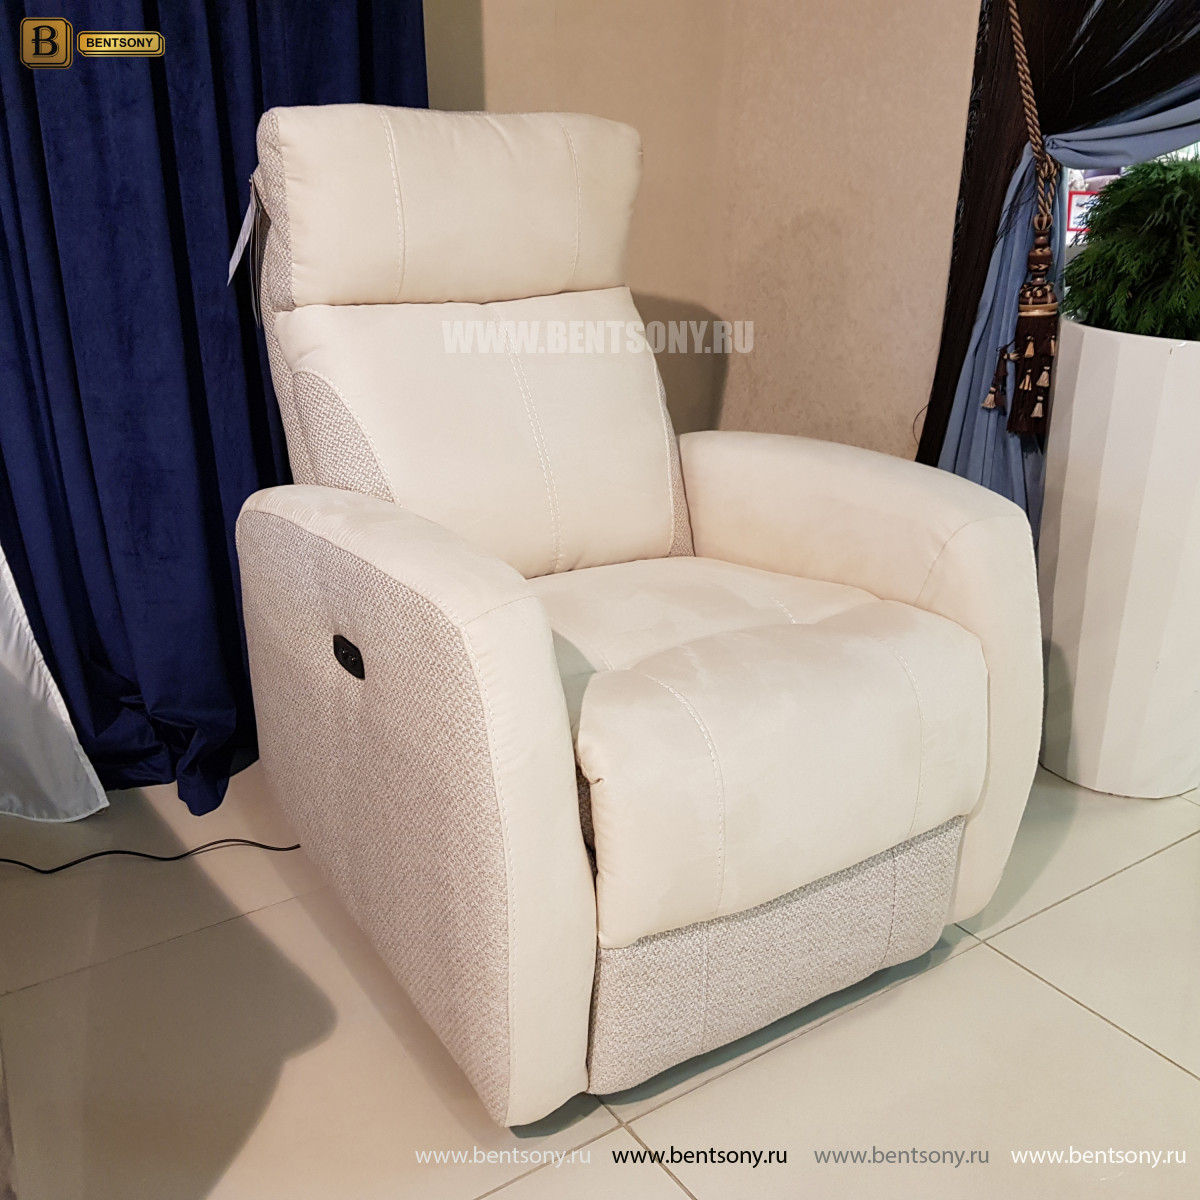 Кресло Эдвард с электрореклайнером интернет магазин